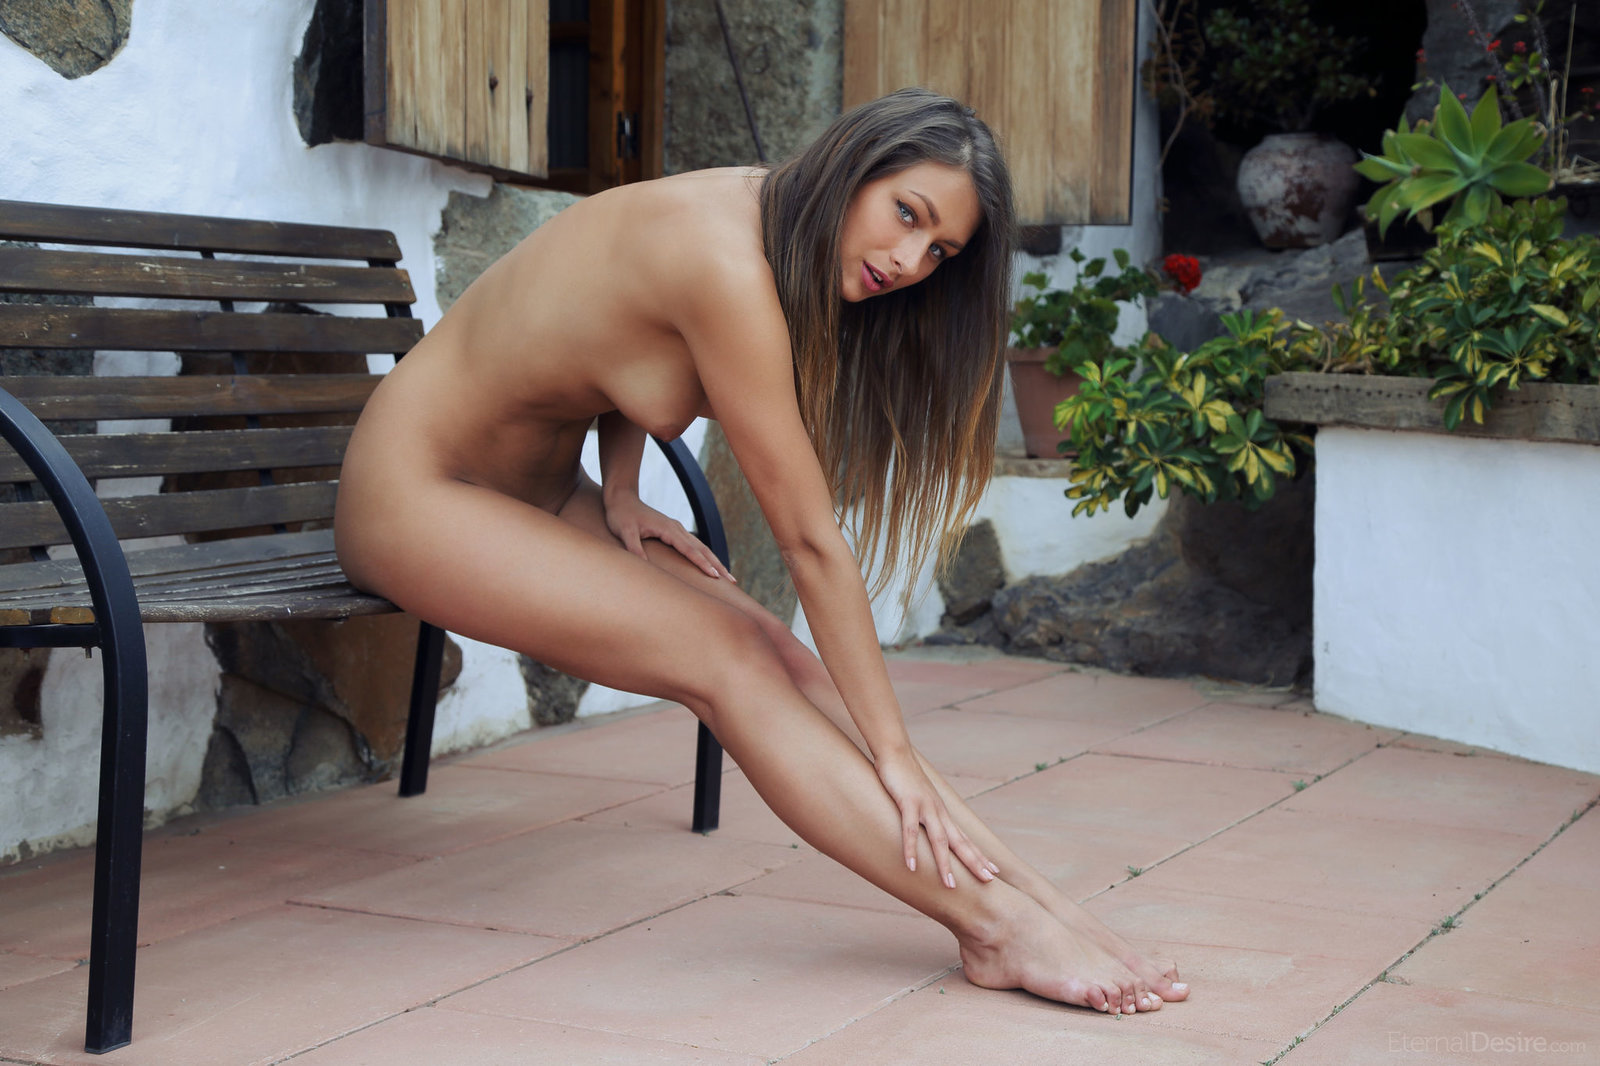 seks-devushkini-nogi-golie-foto-muzhchin